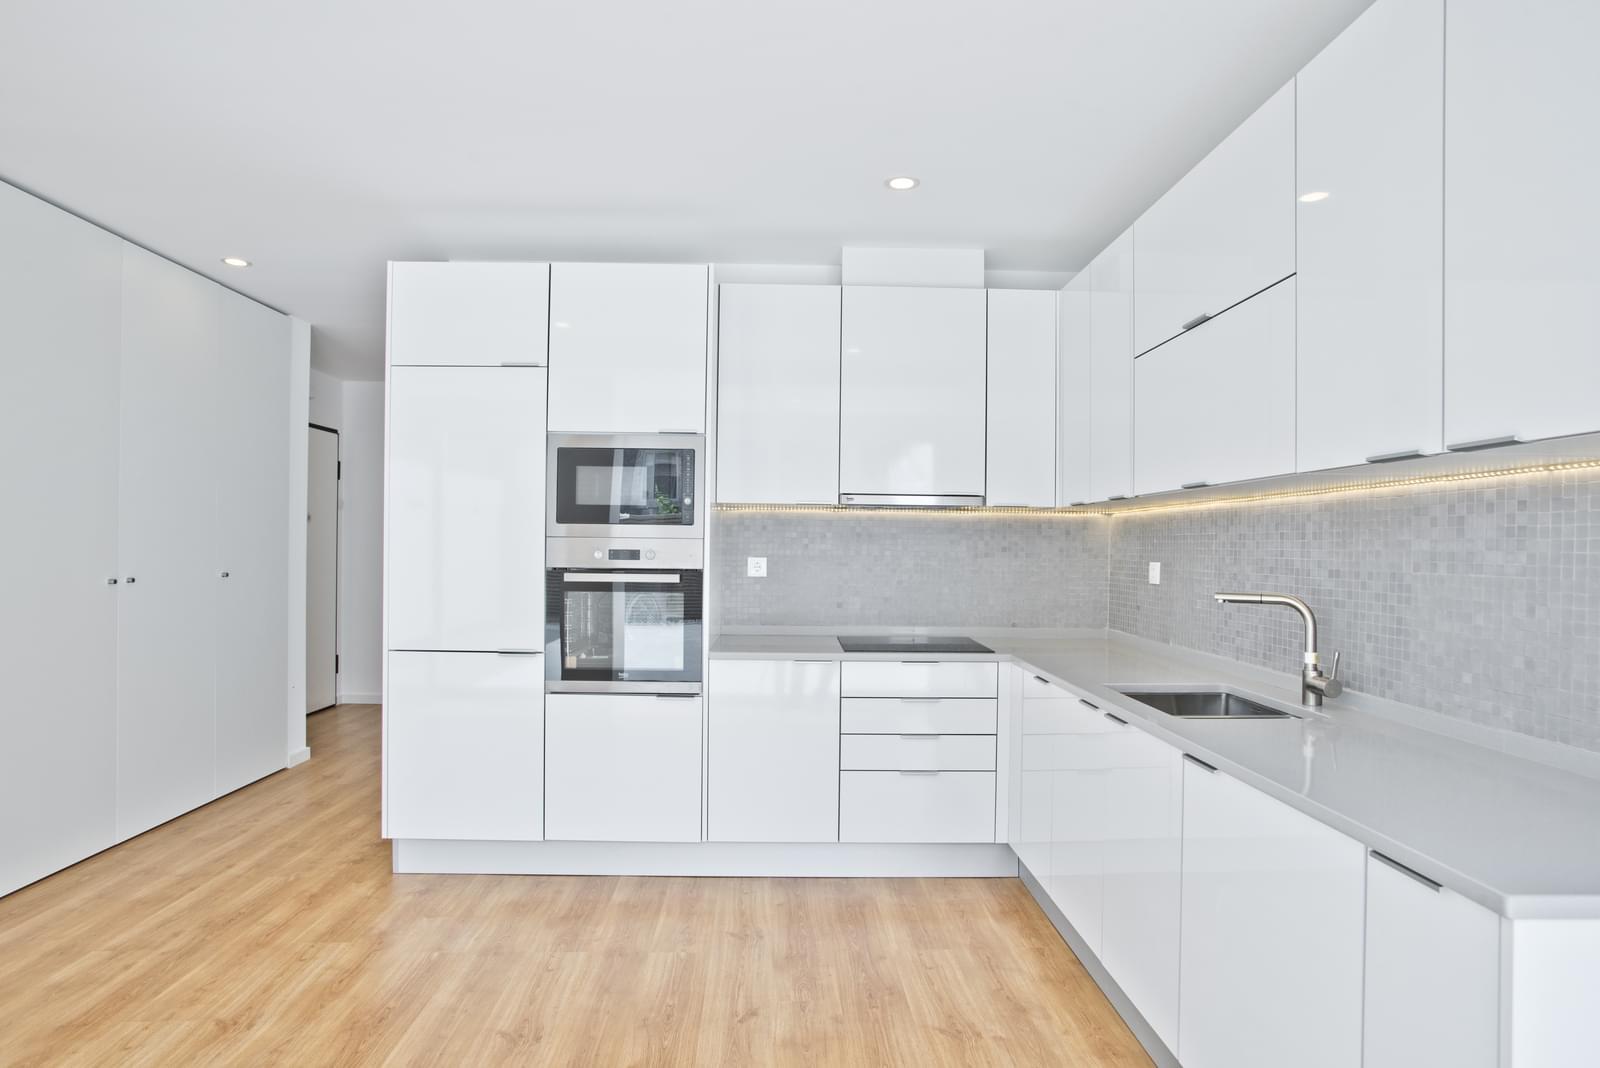 pf16986-apartamento-t2-cascais-adc03b9d-0b1b-4e1b-811b-1f39c8898605